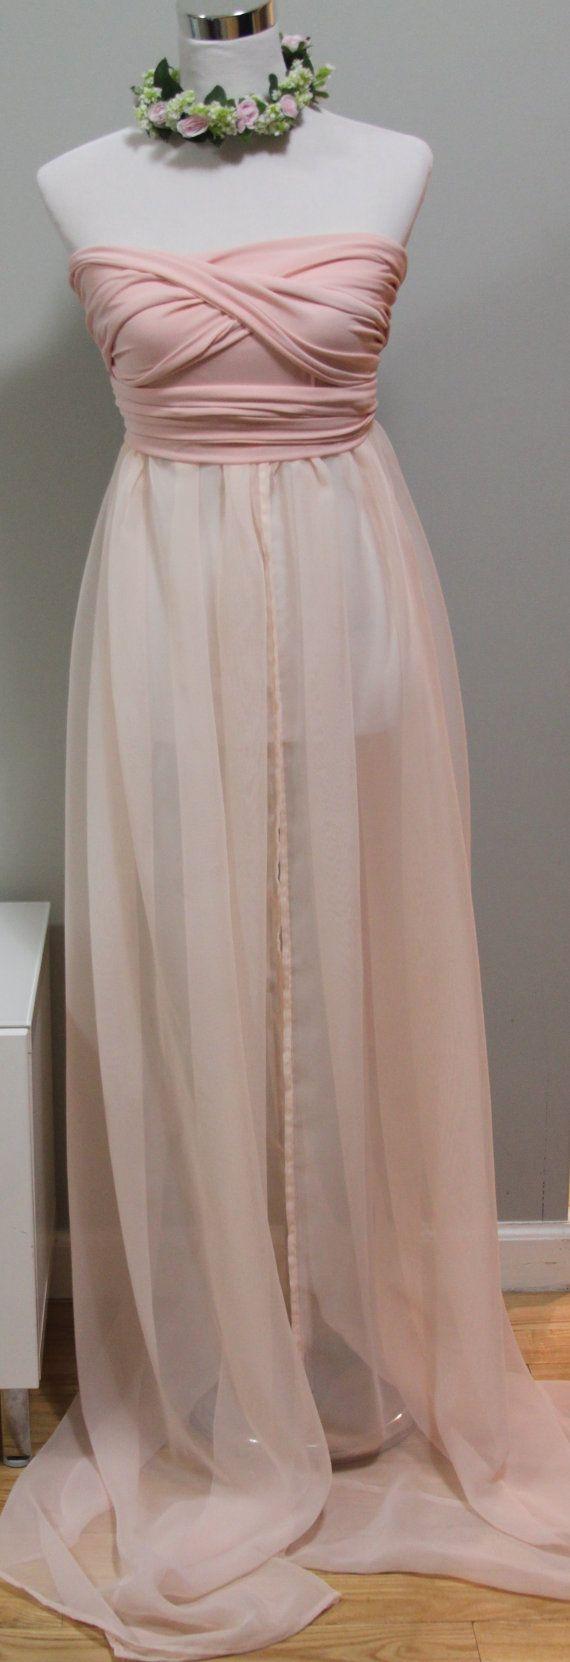 Infinity Maternity Gown, Photo Prop, jersey and chiffon blush pink ...